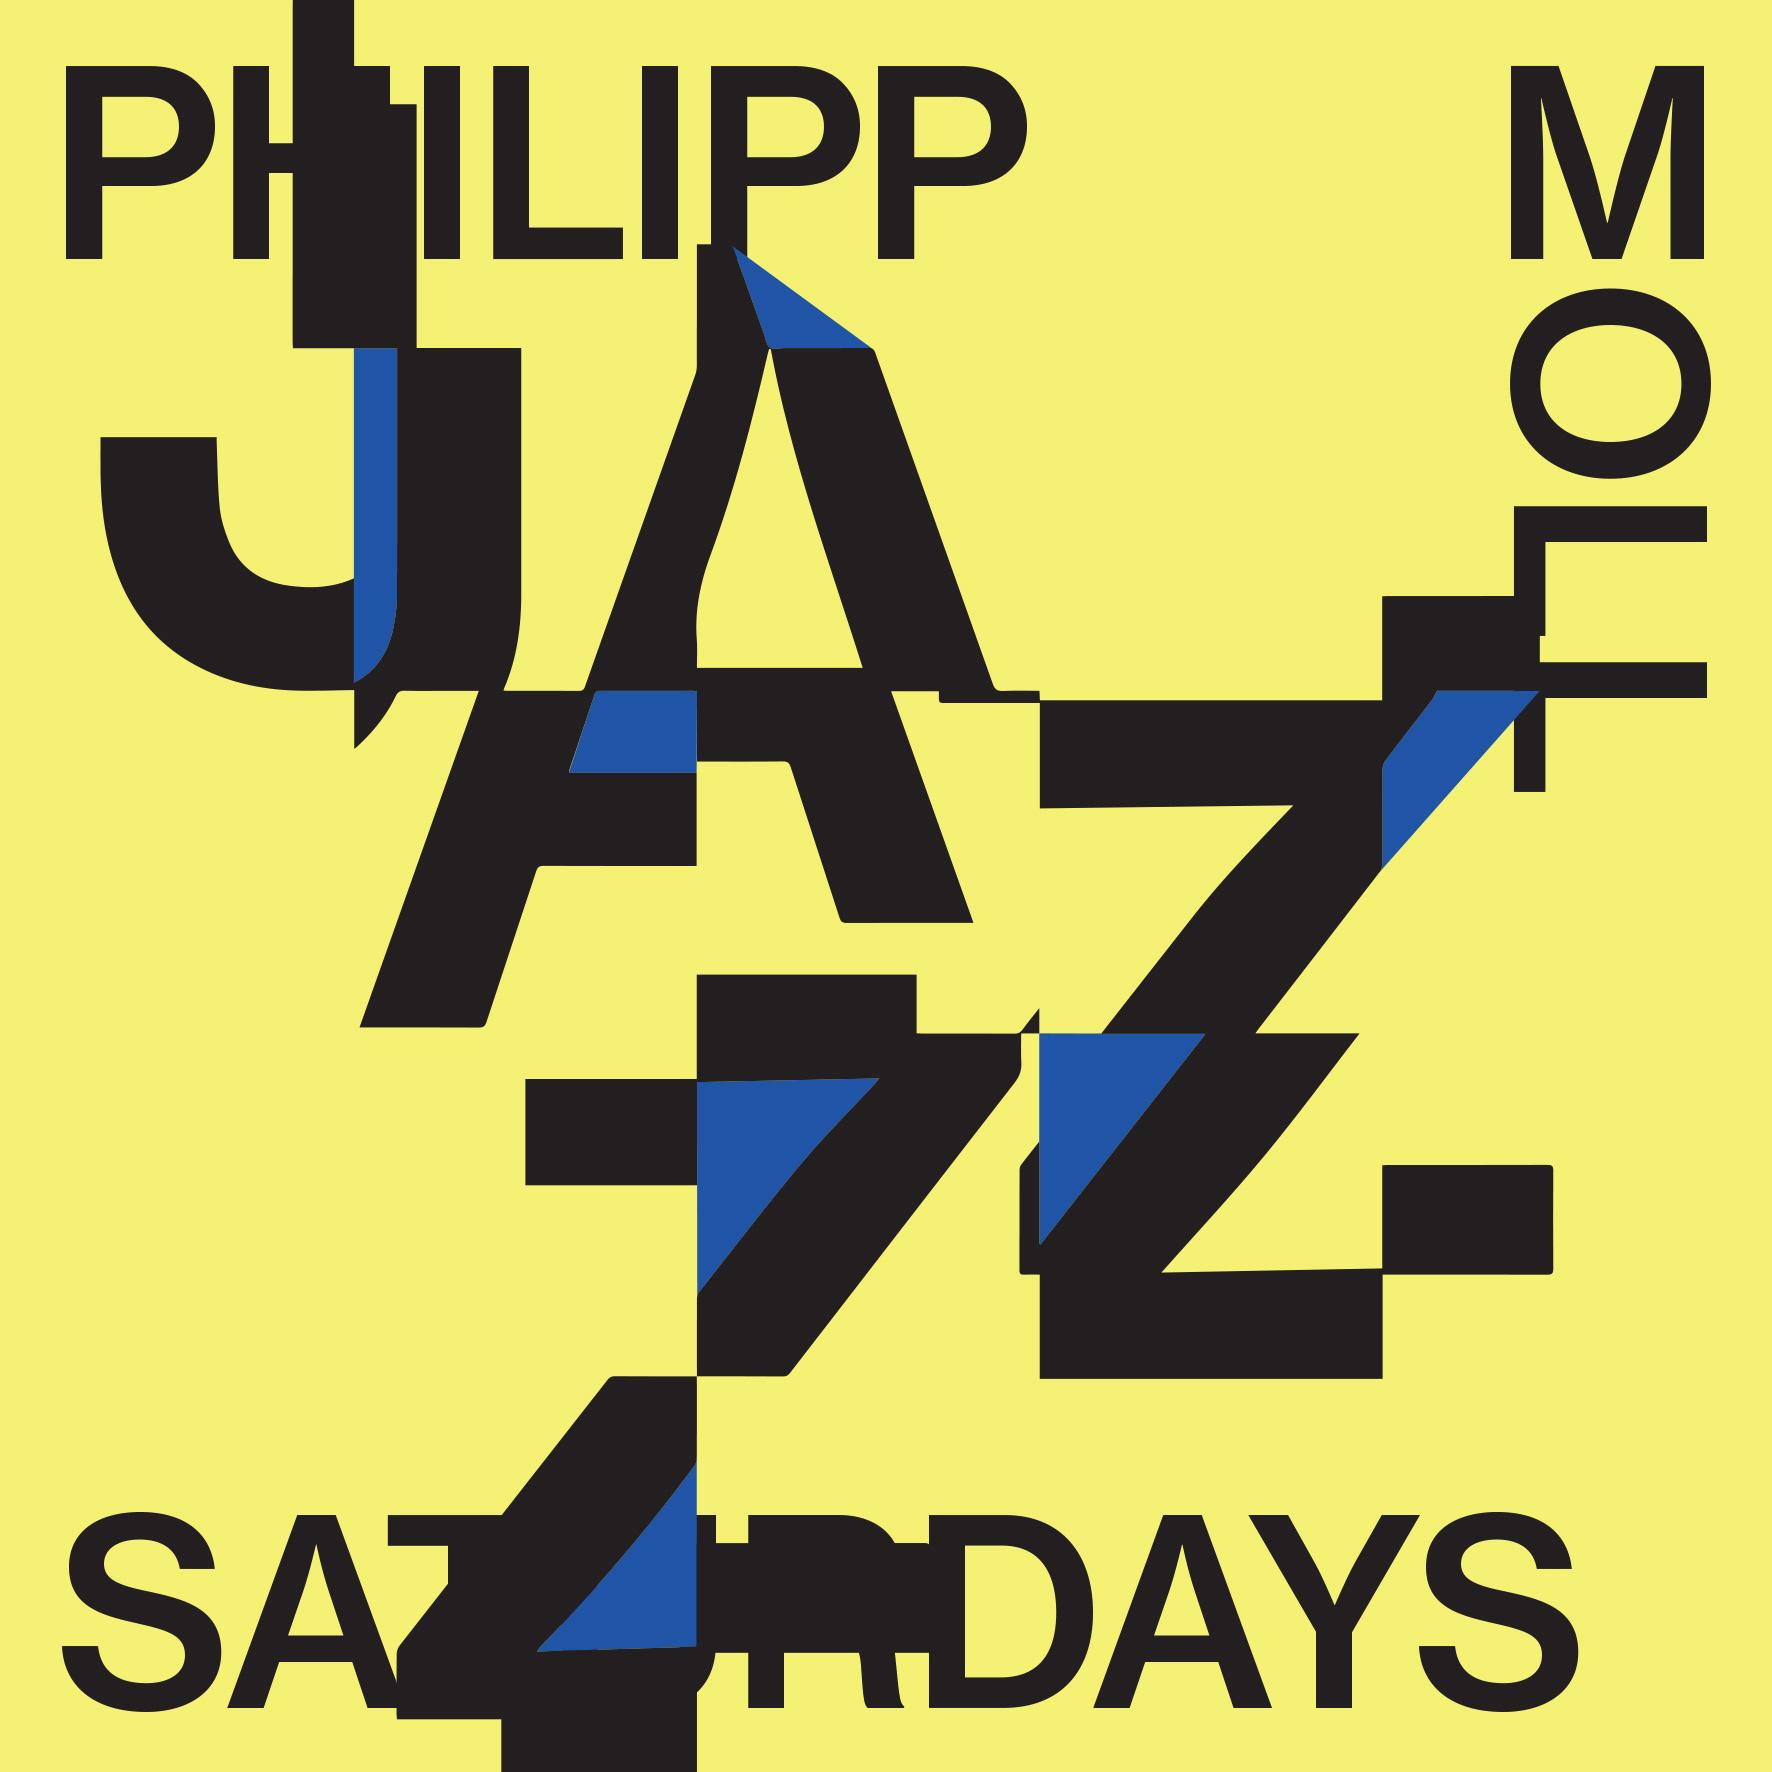 PHILIPPMOLL_JAZZ_SATURDAYS